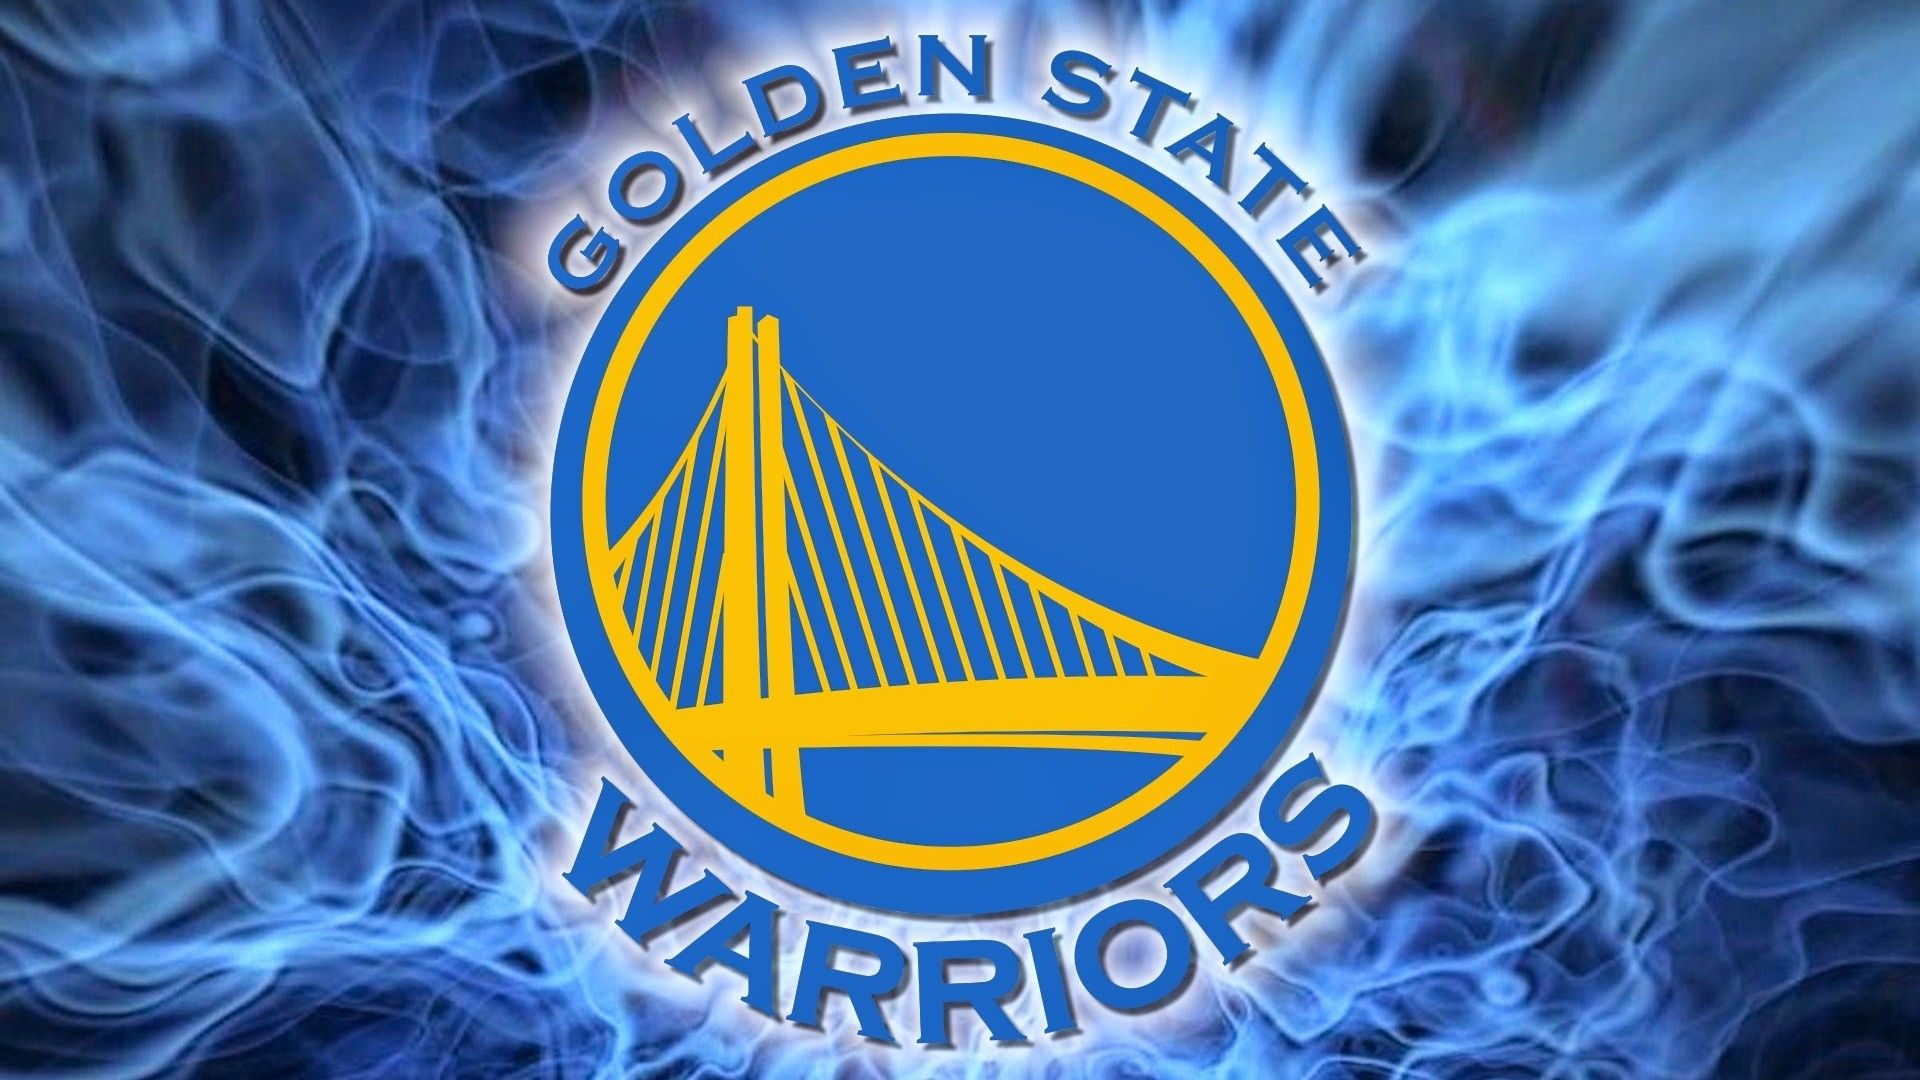 Warriors For Pc Wallpaper Basketball Wallpapers Hd Wallpaper